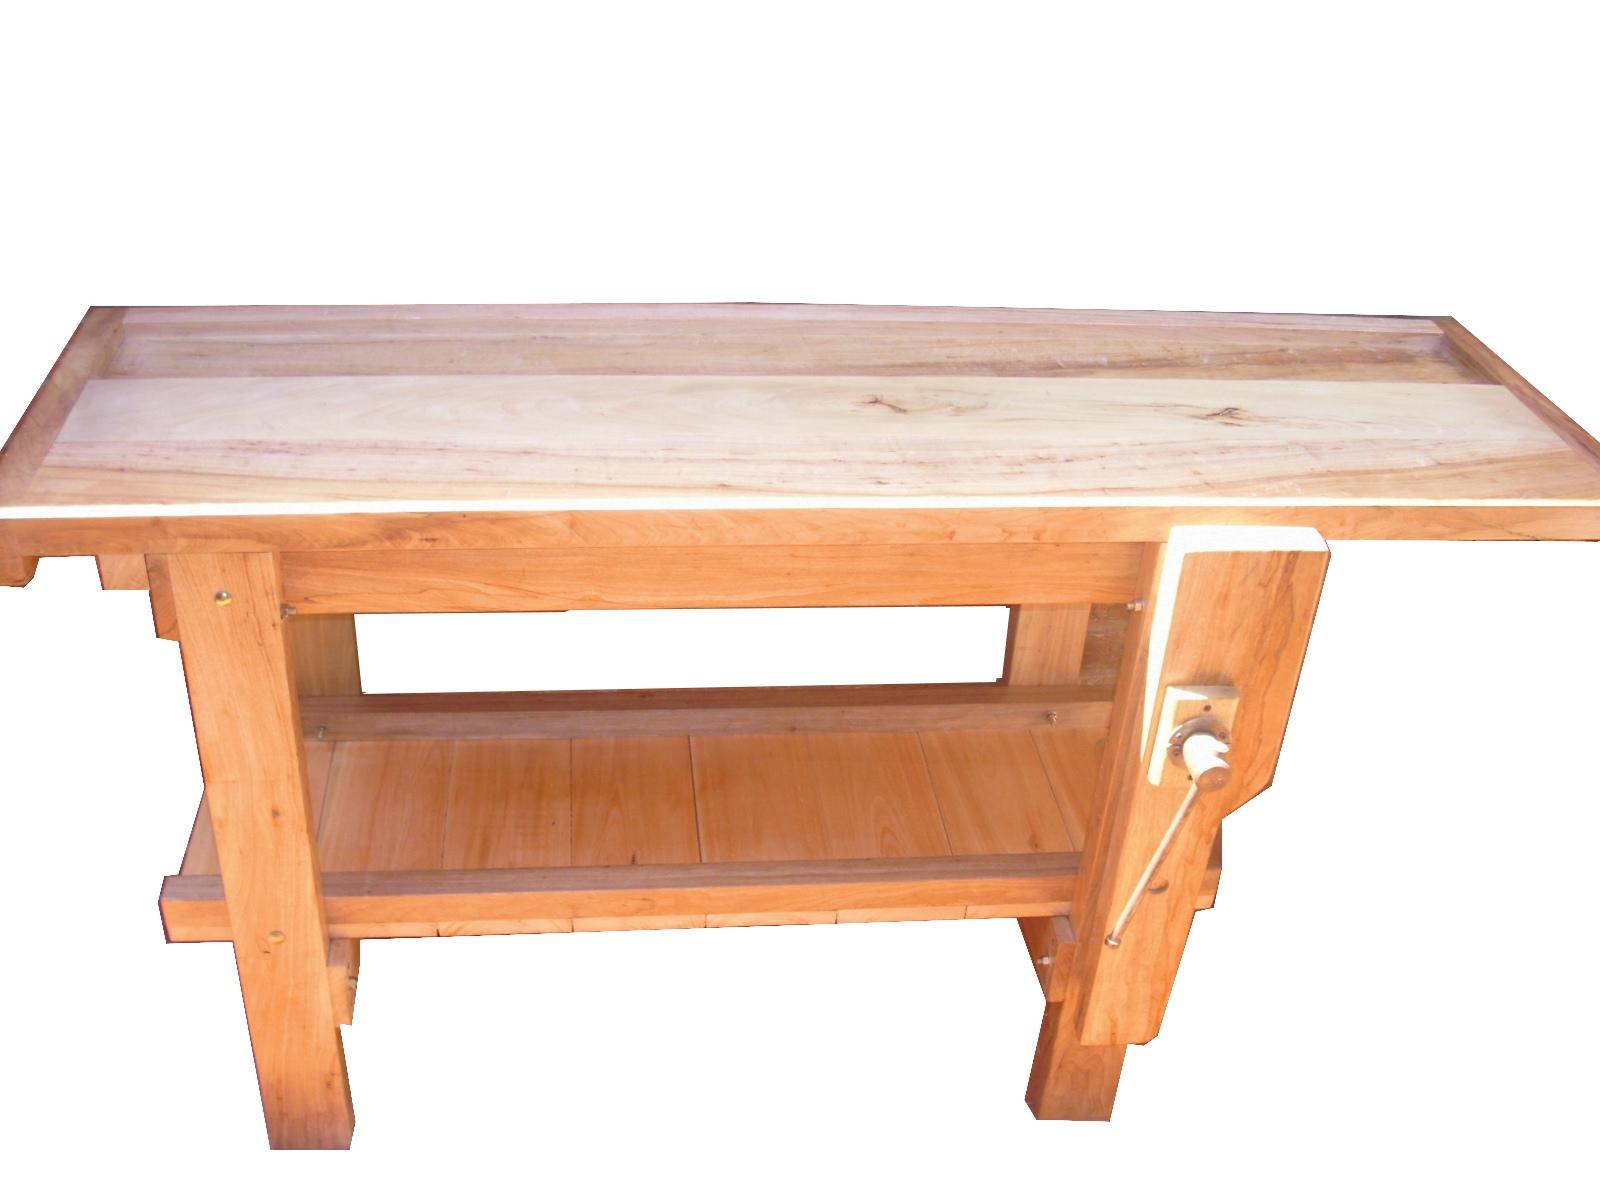 Banco de carpintero en madera dura carpinterof - Banco de madera ...